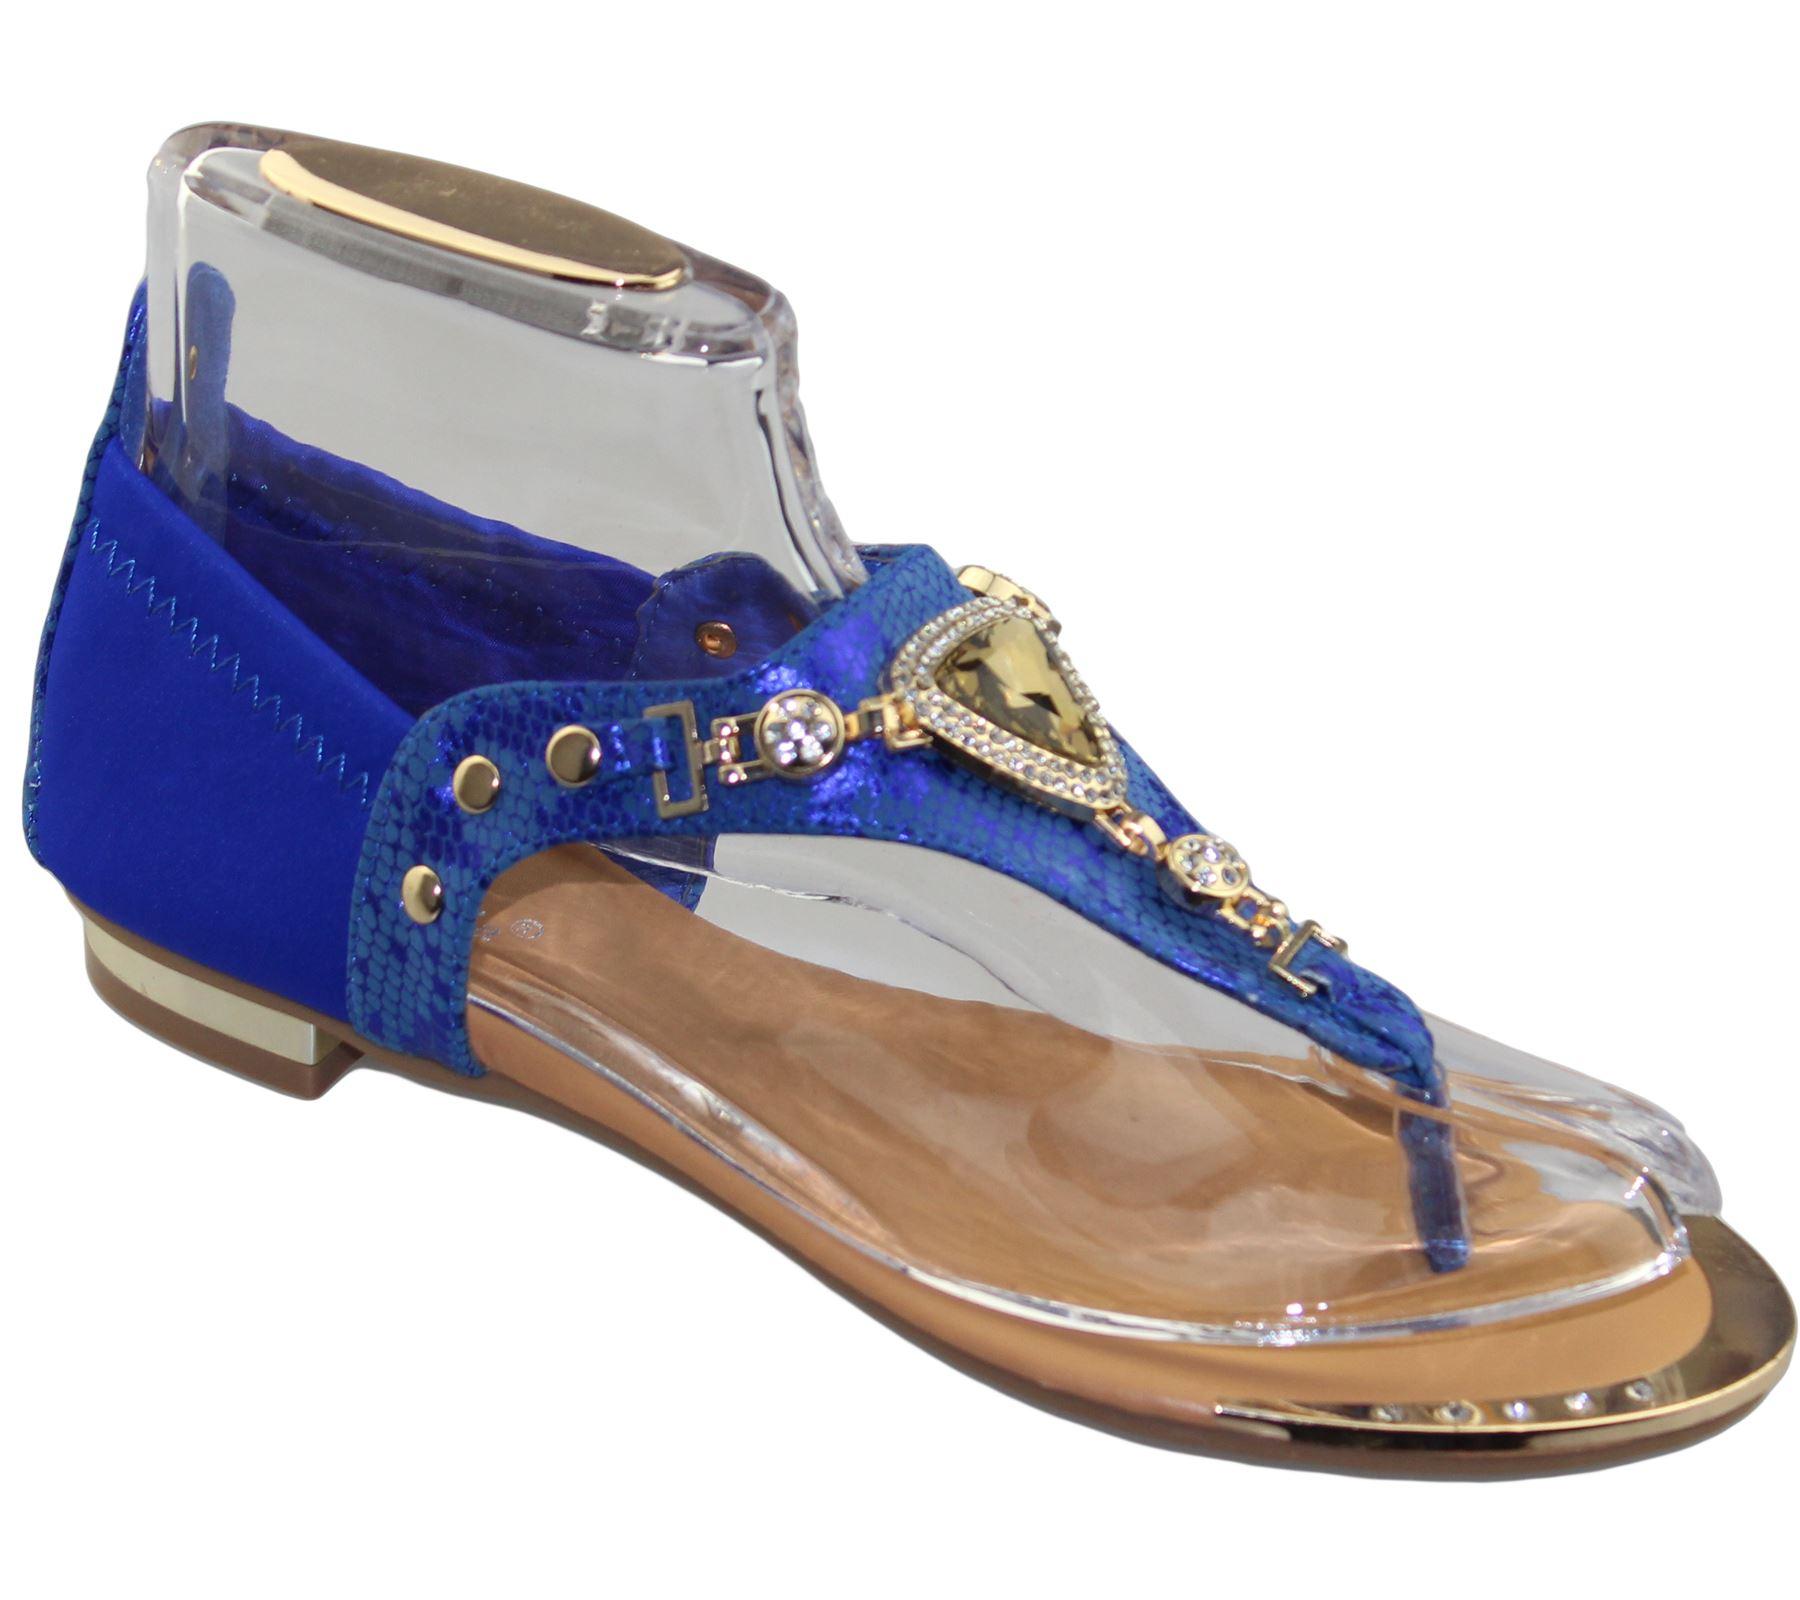 Womens-Flat-Summer-Sandals-Ladies-Diamante-Wedding-Toe-Post-Casual-Slipper thumbnail 23